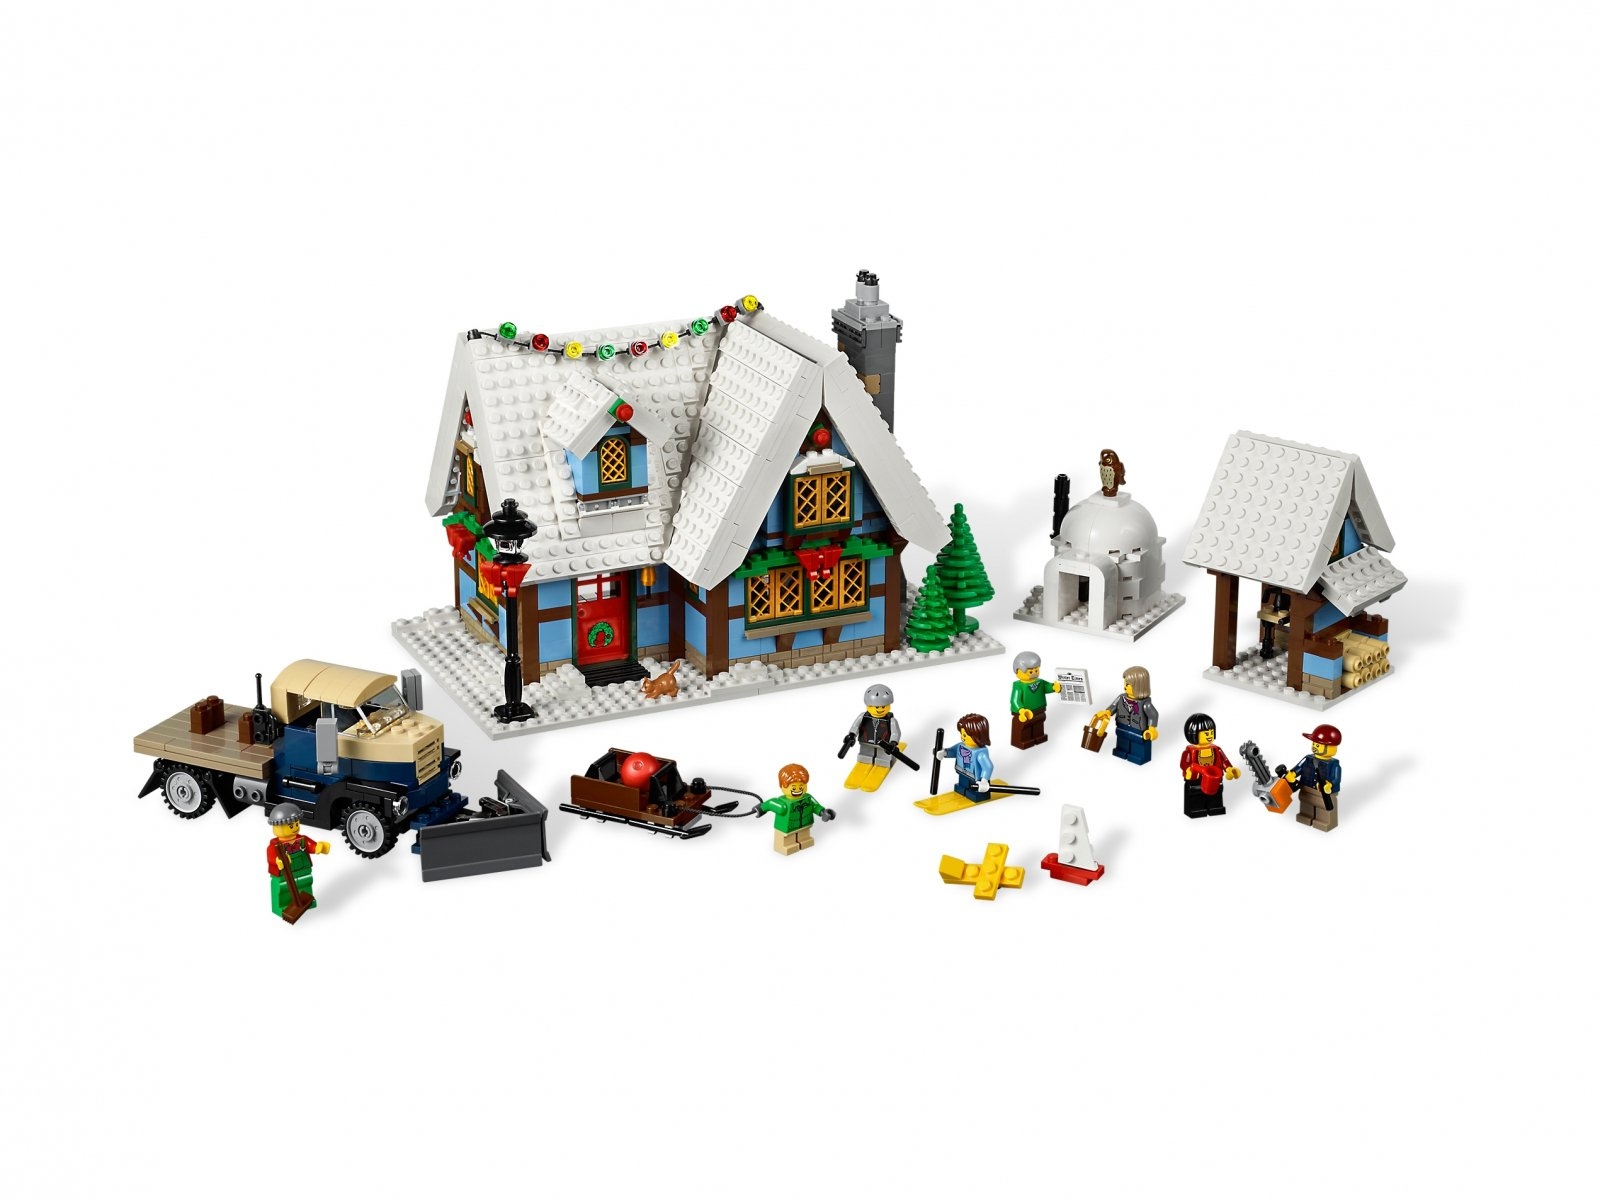 LEGO 10229 Creator Expert Zimowa chata